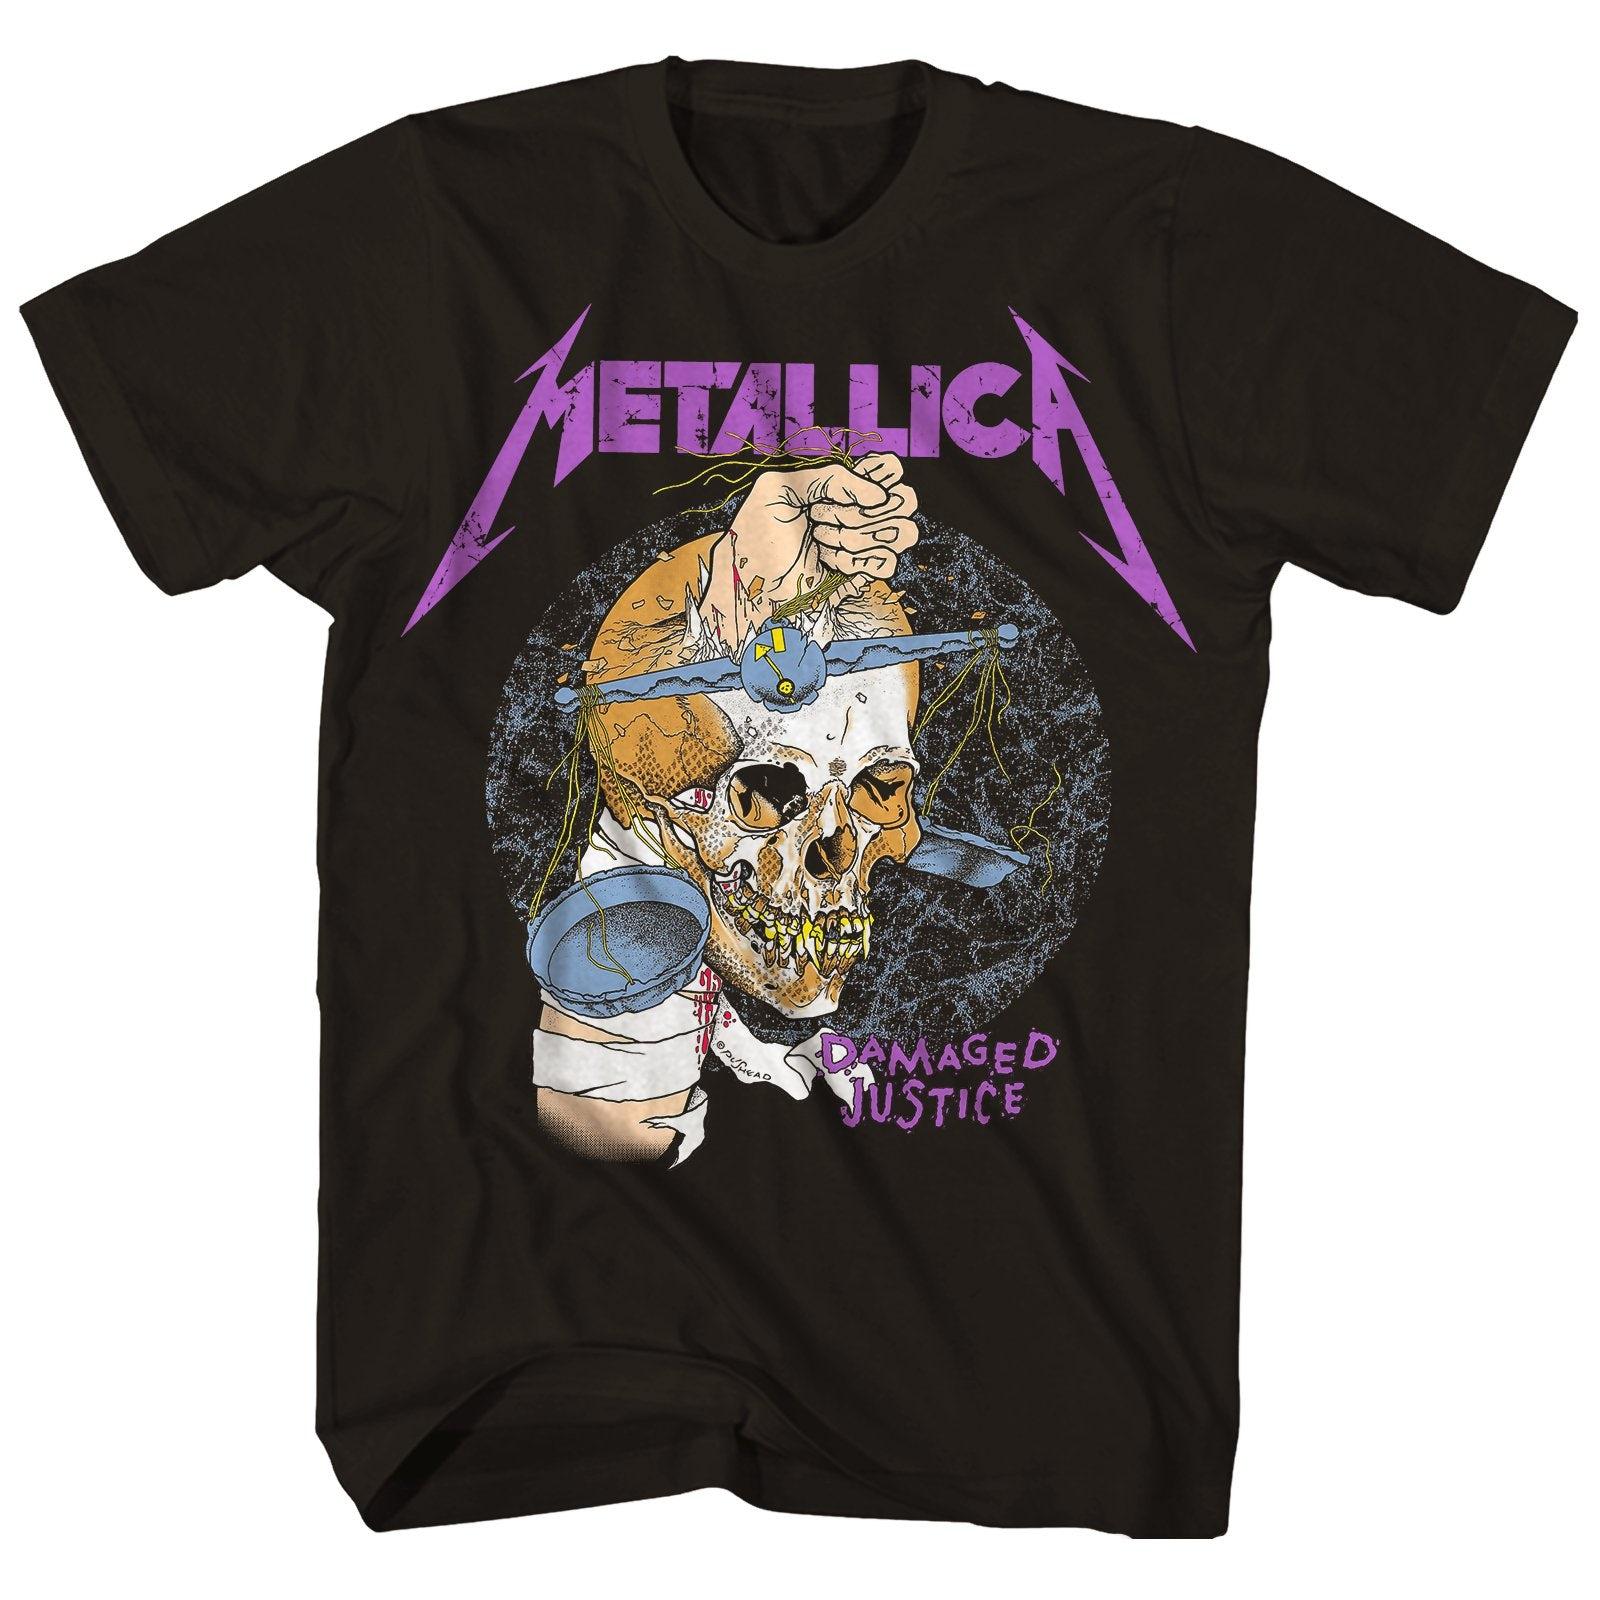 T-shirt Femme Rock Metallica Damaged Justice Style vintage Neuf